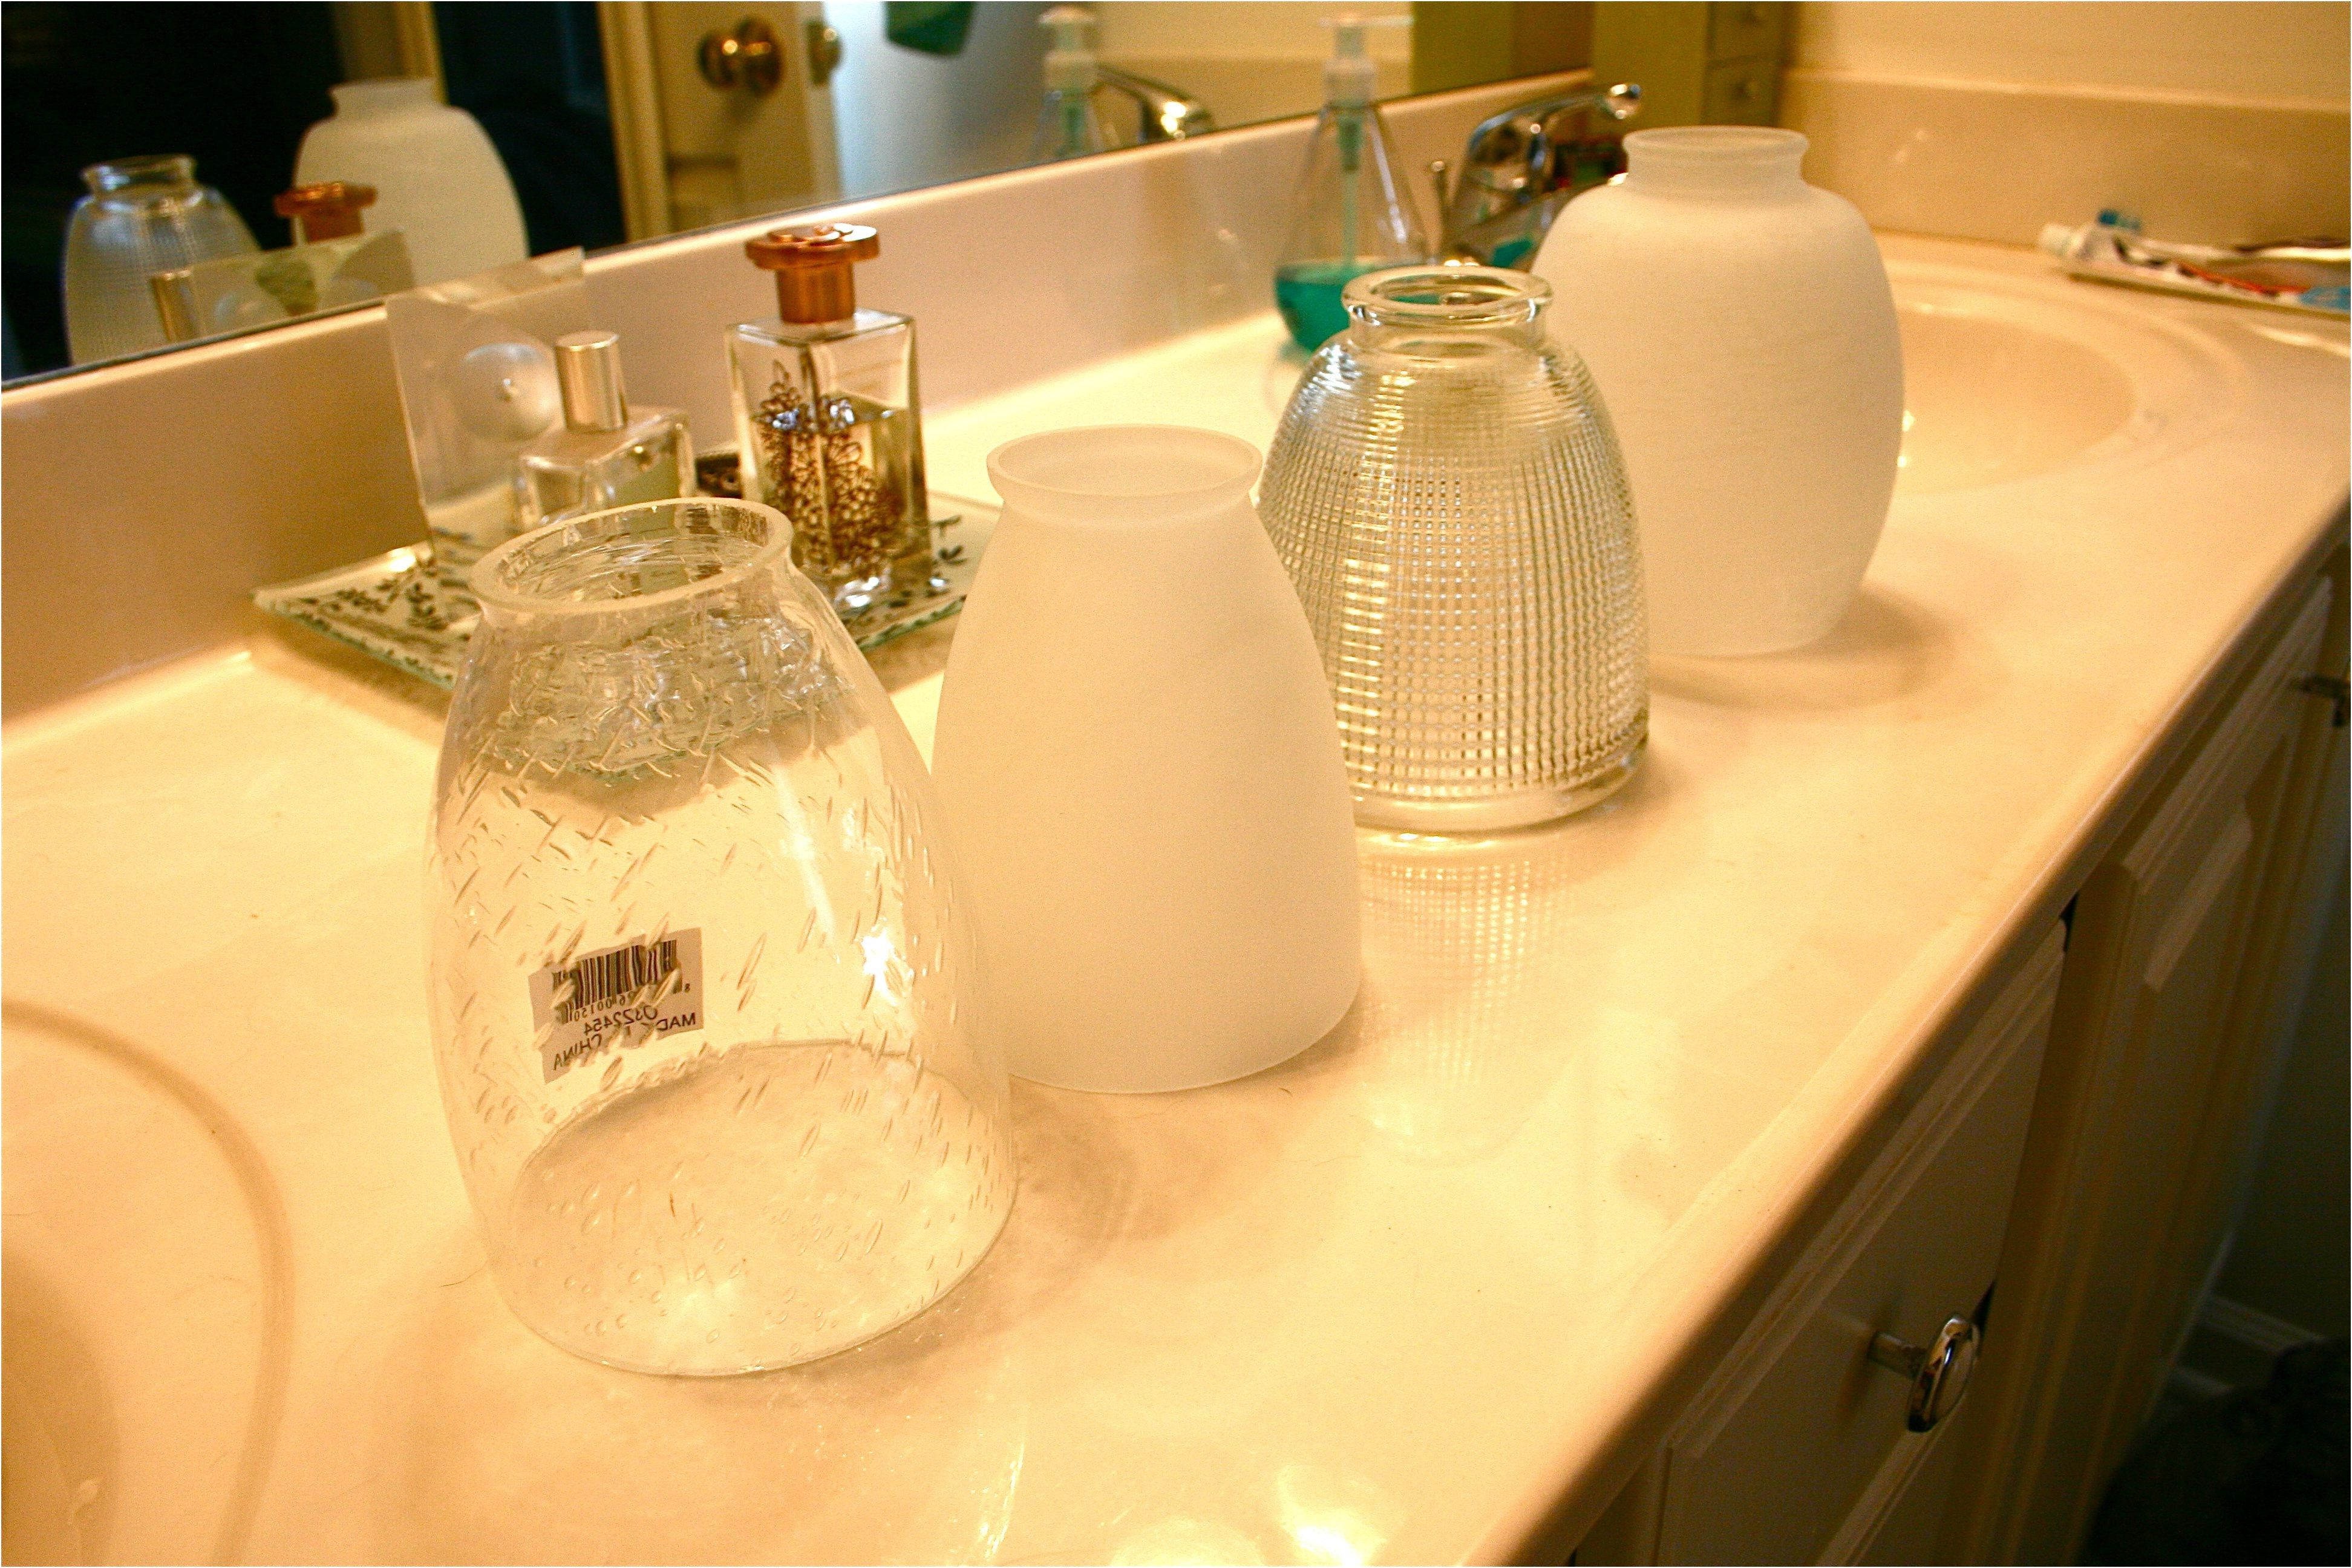 Updating The Bathroom Light Fixture Dream Green Diy From Replacement Glass For Bathroom Light Fixture Bathroom Light Fixtures Bathroom Update Light Fixtures